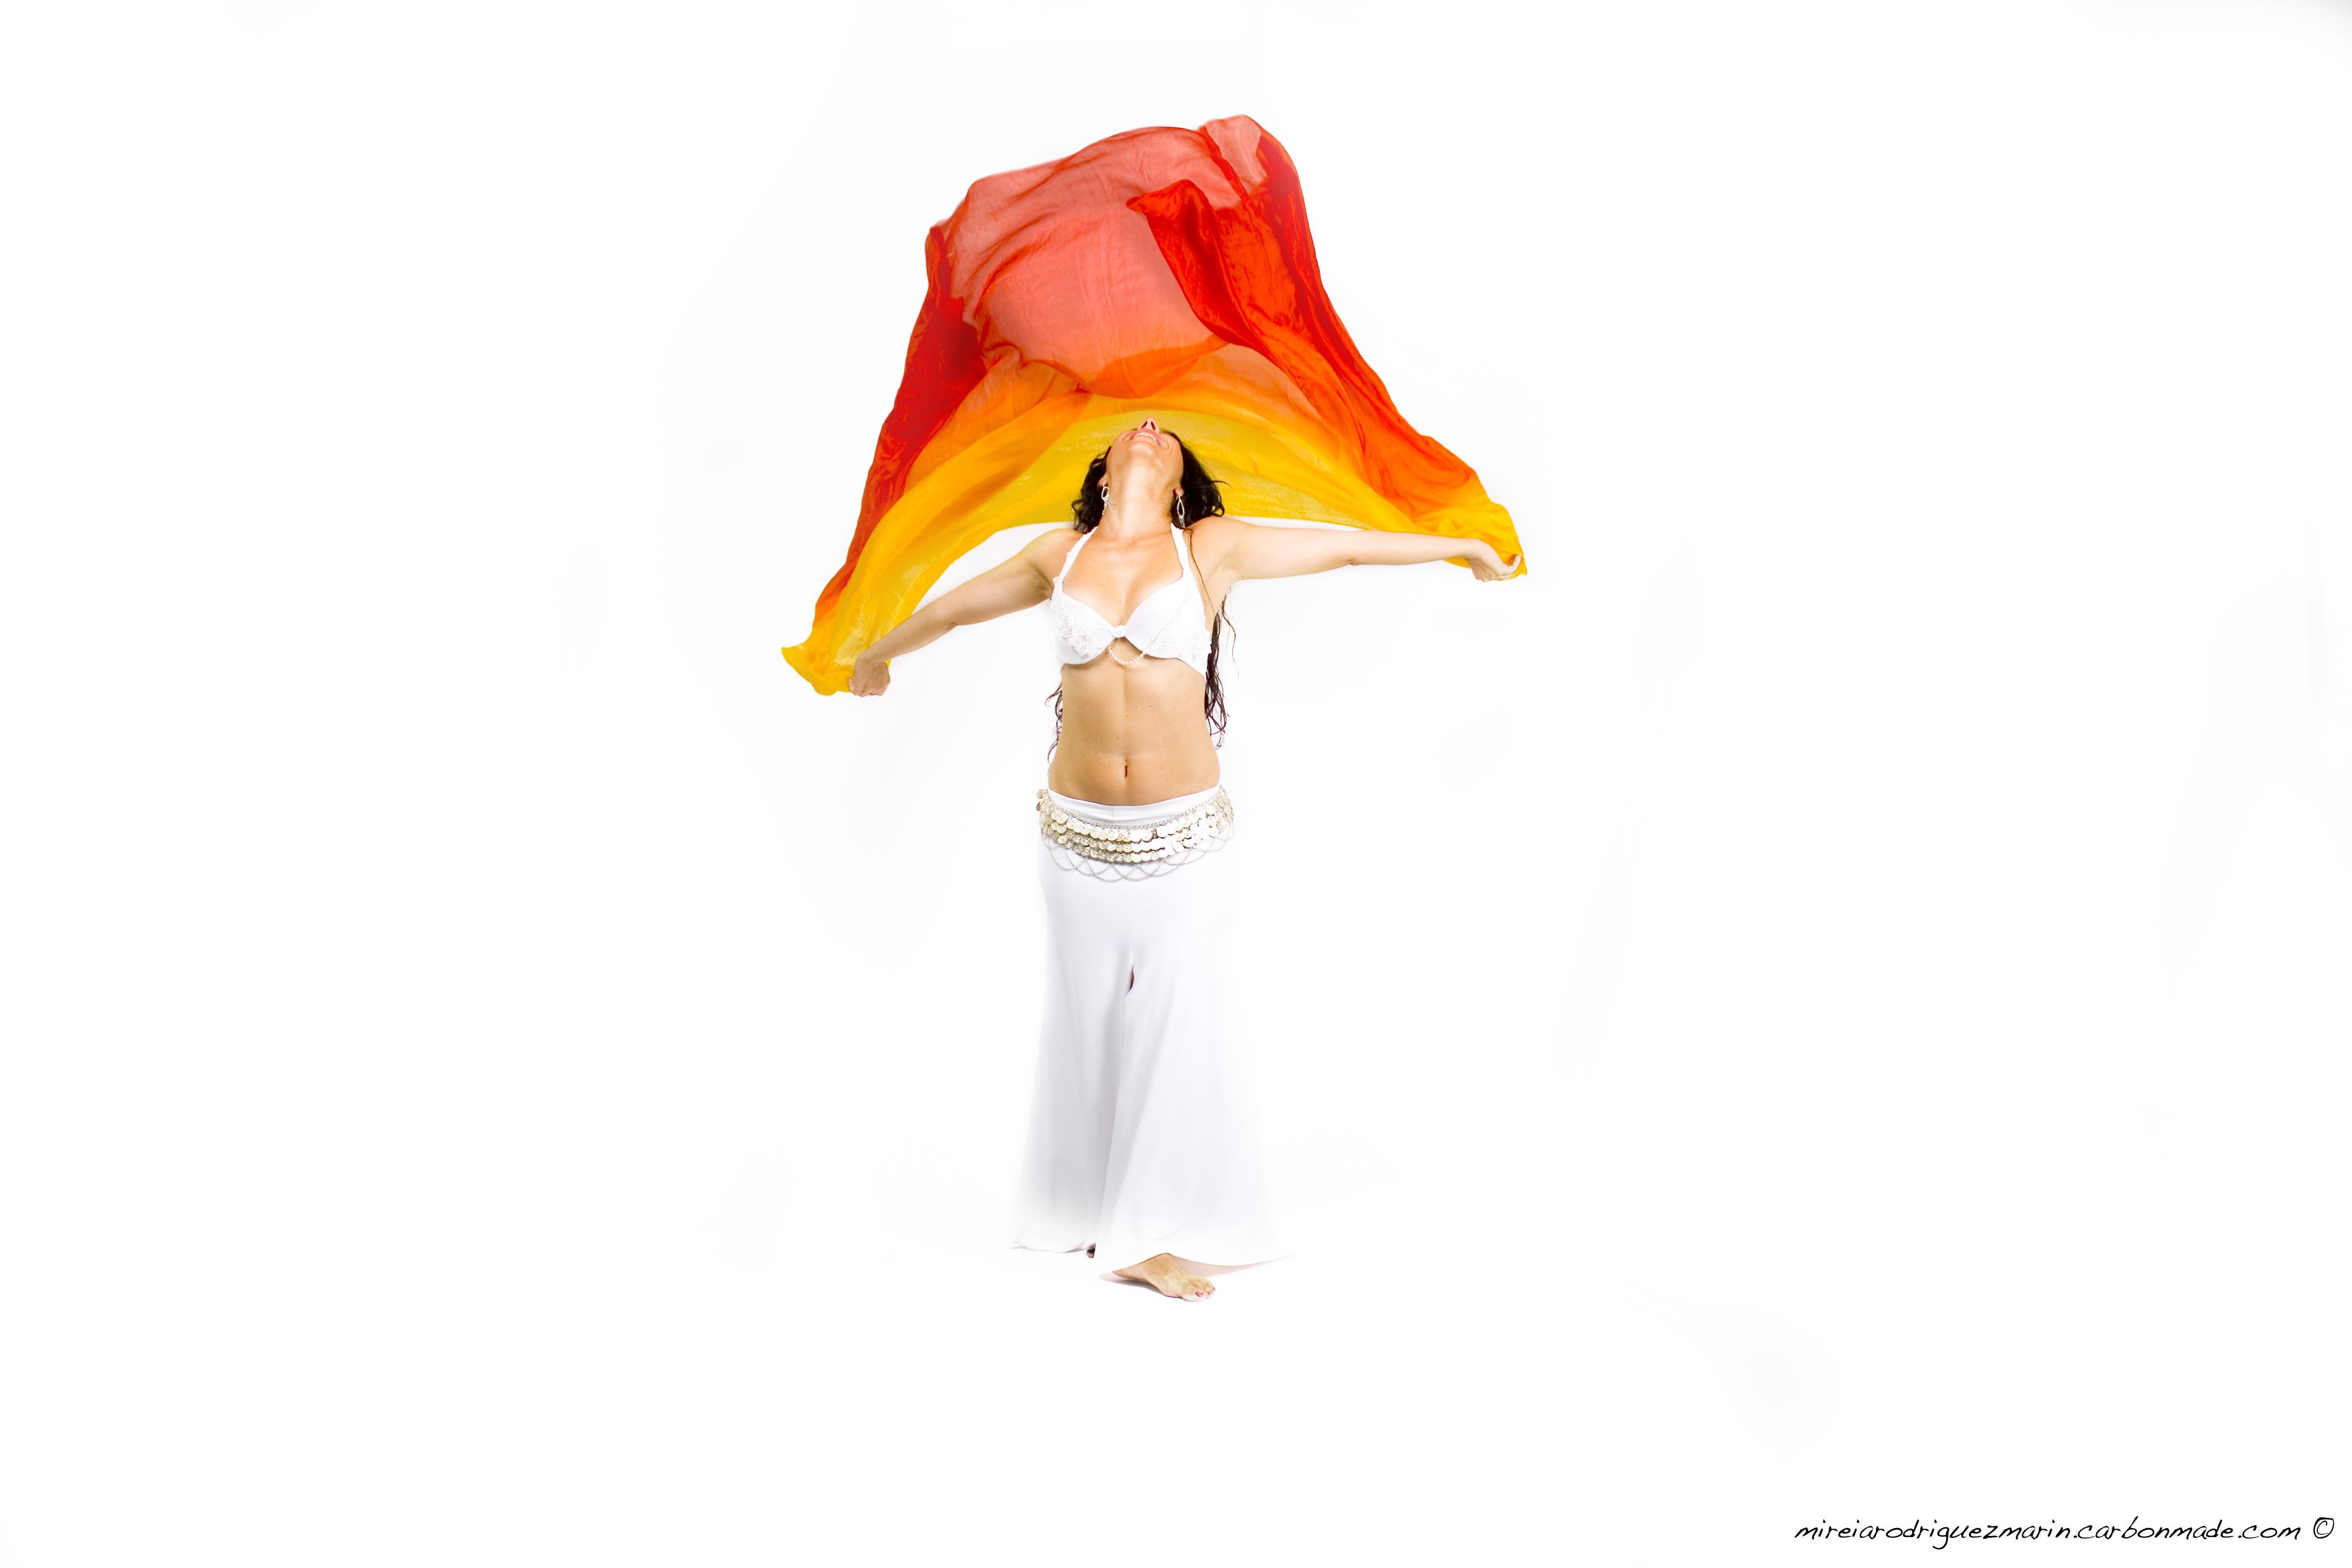 www.danzarabic.com